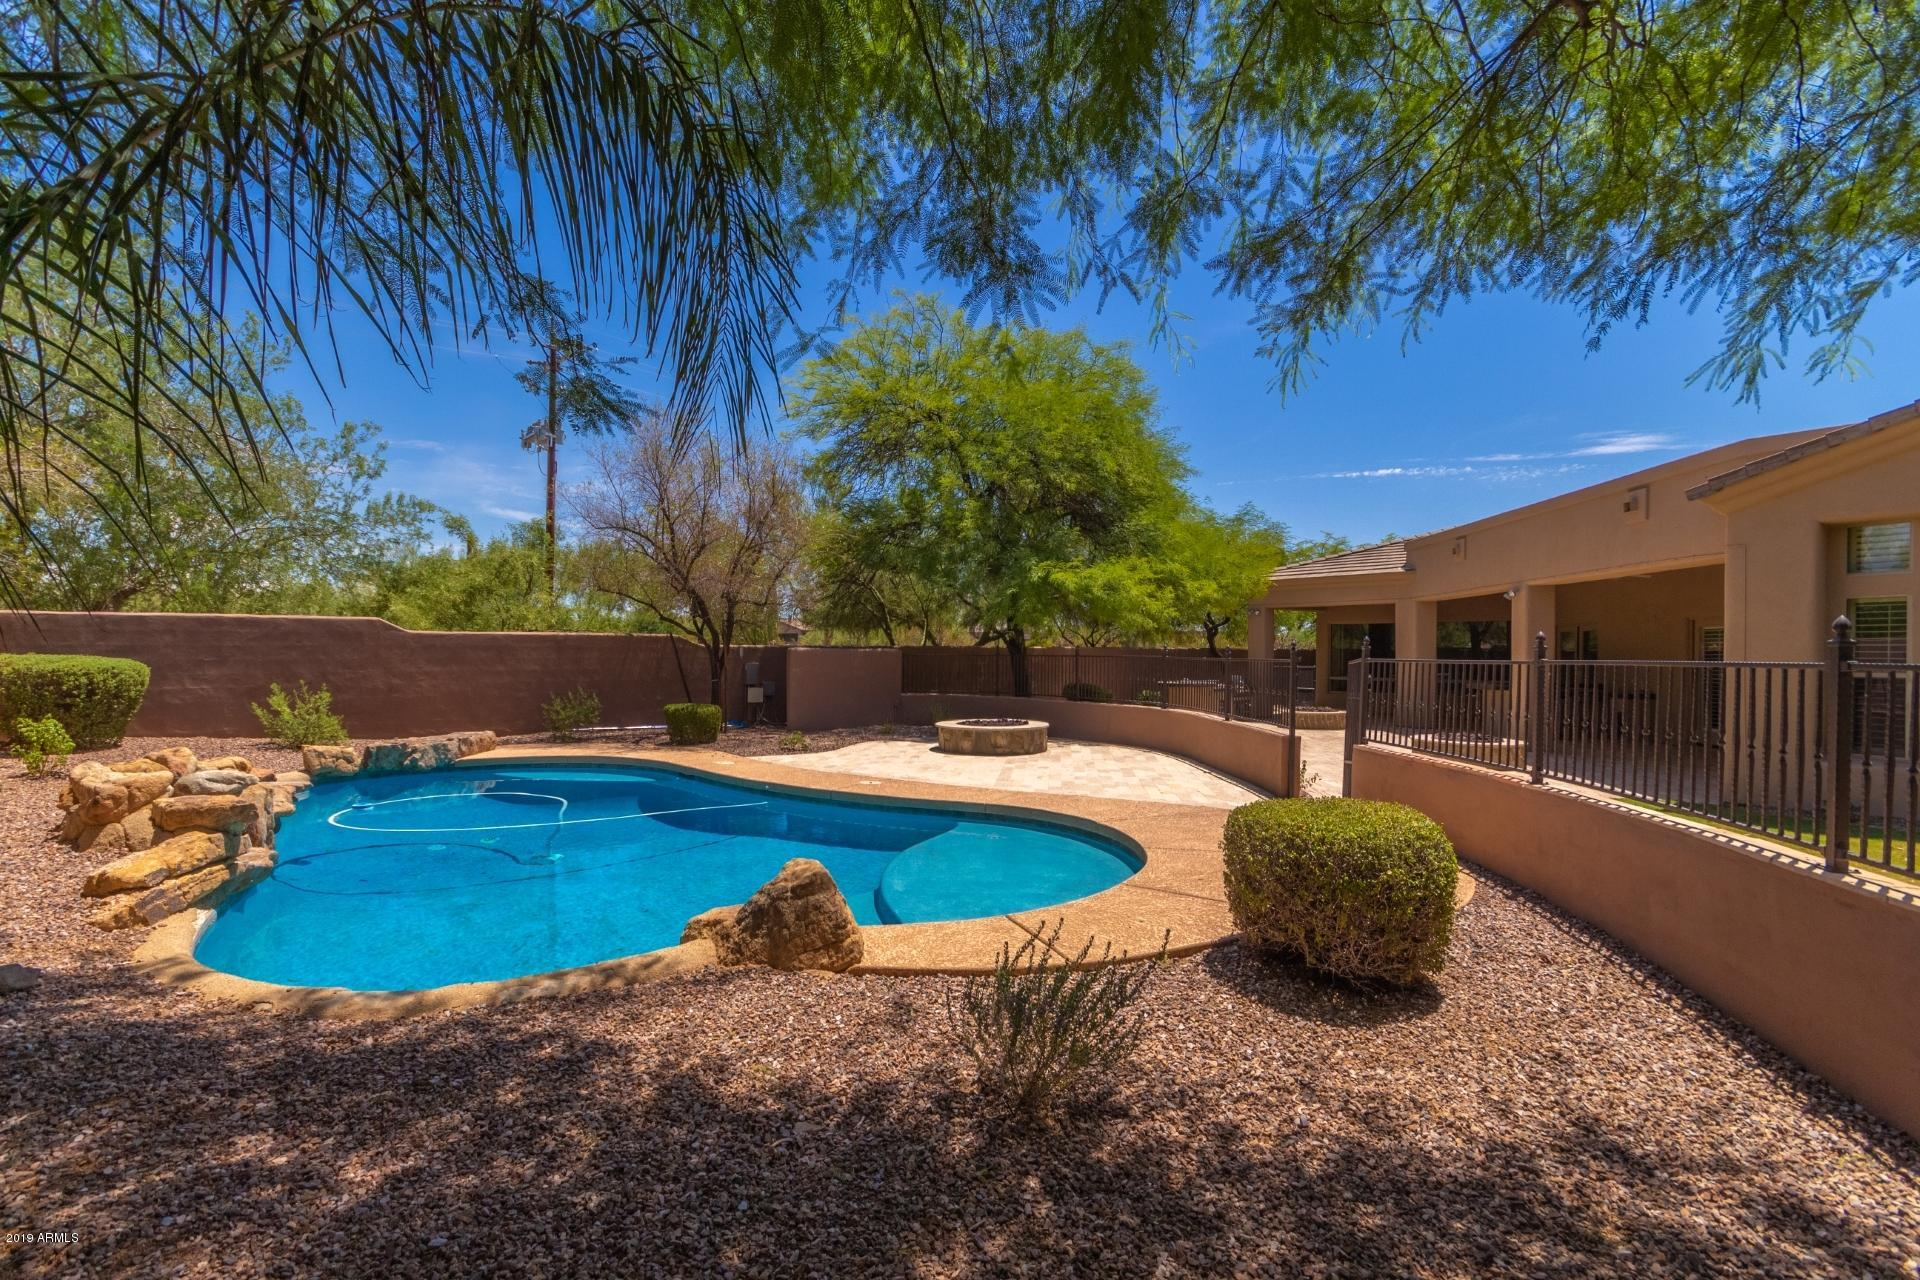 MLS 5961488 6386 E BENT TREE Drive, Scottsdale, AZ 85266 Scottsdale AZ Private Pool